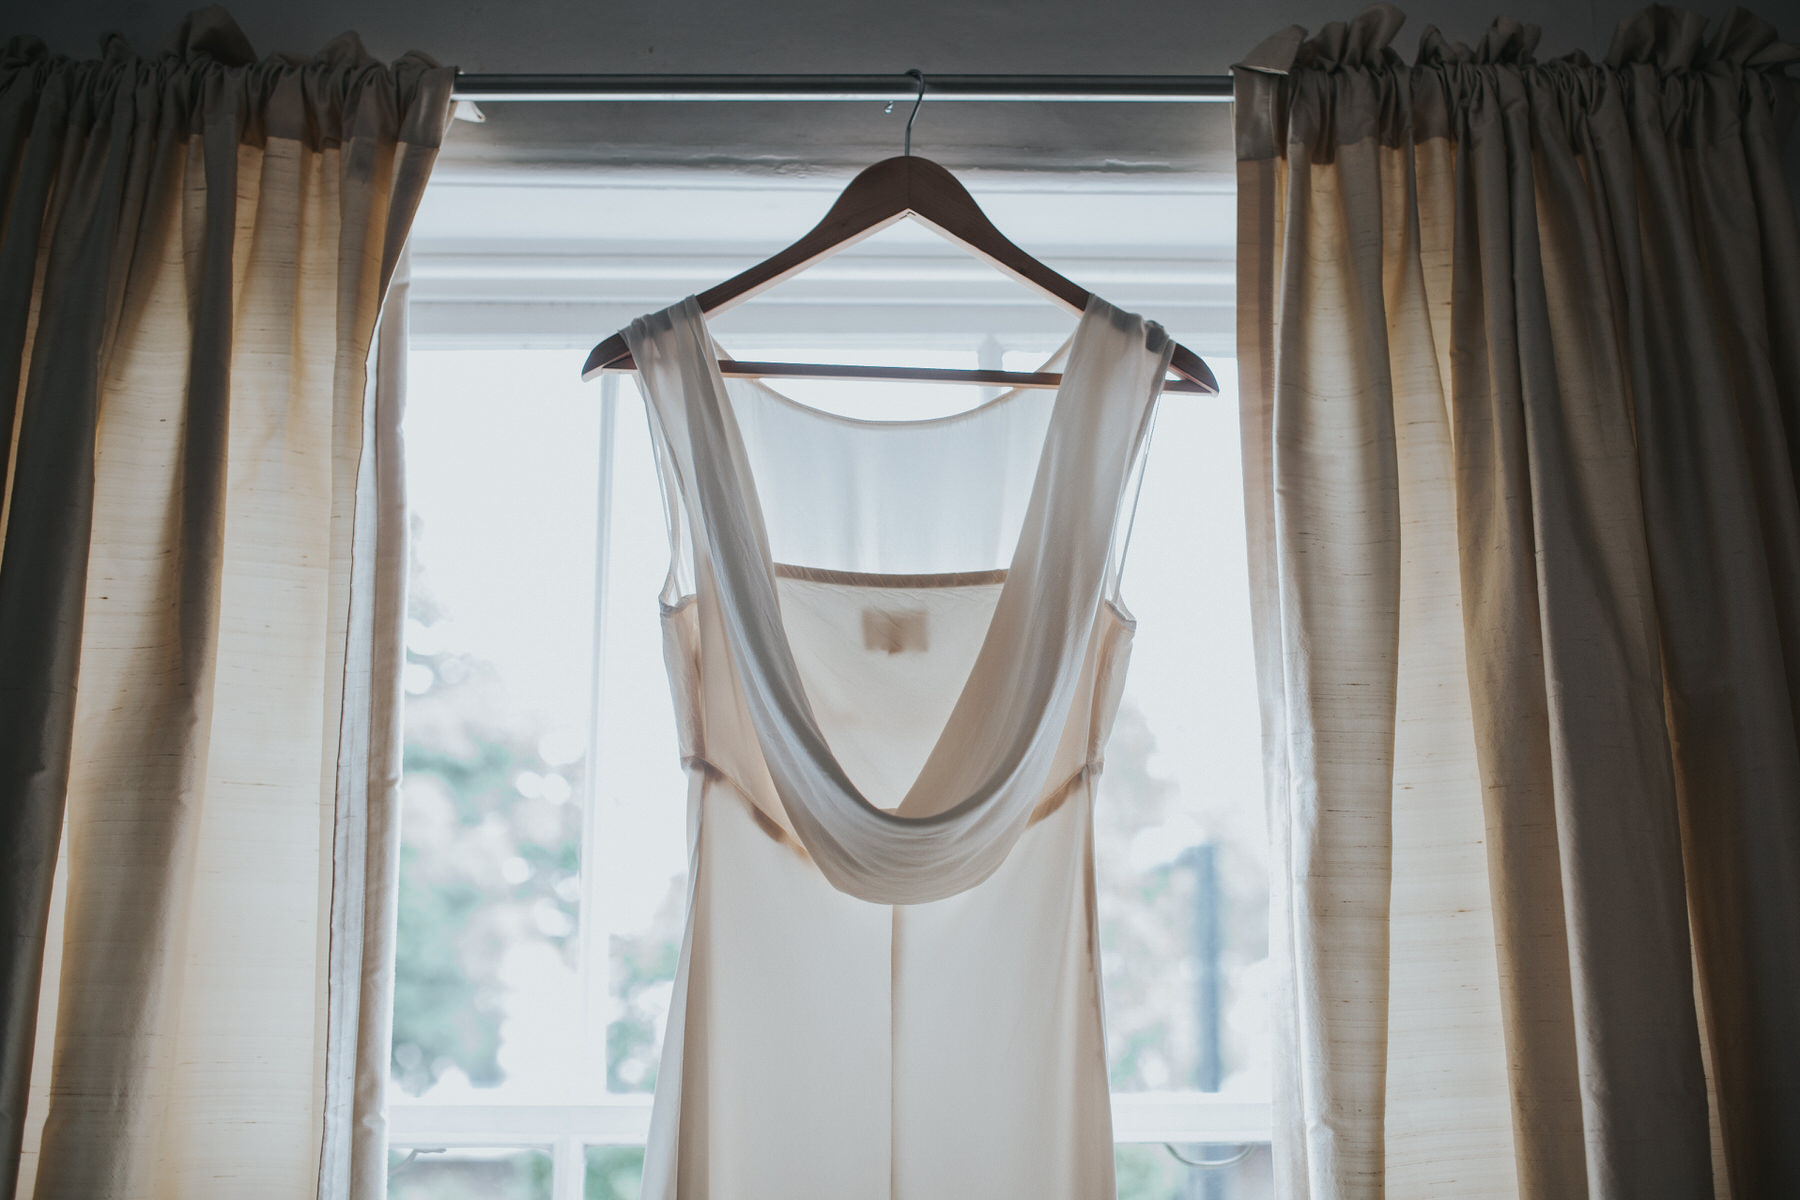 24 Ghost wedding dress silhouette Yolande De Vries Photography.jpg